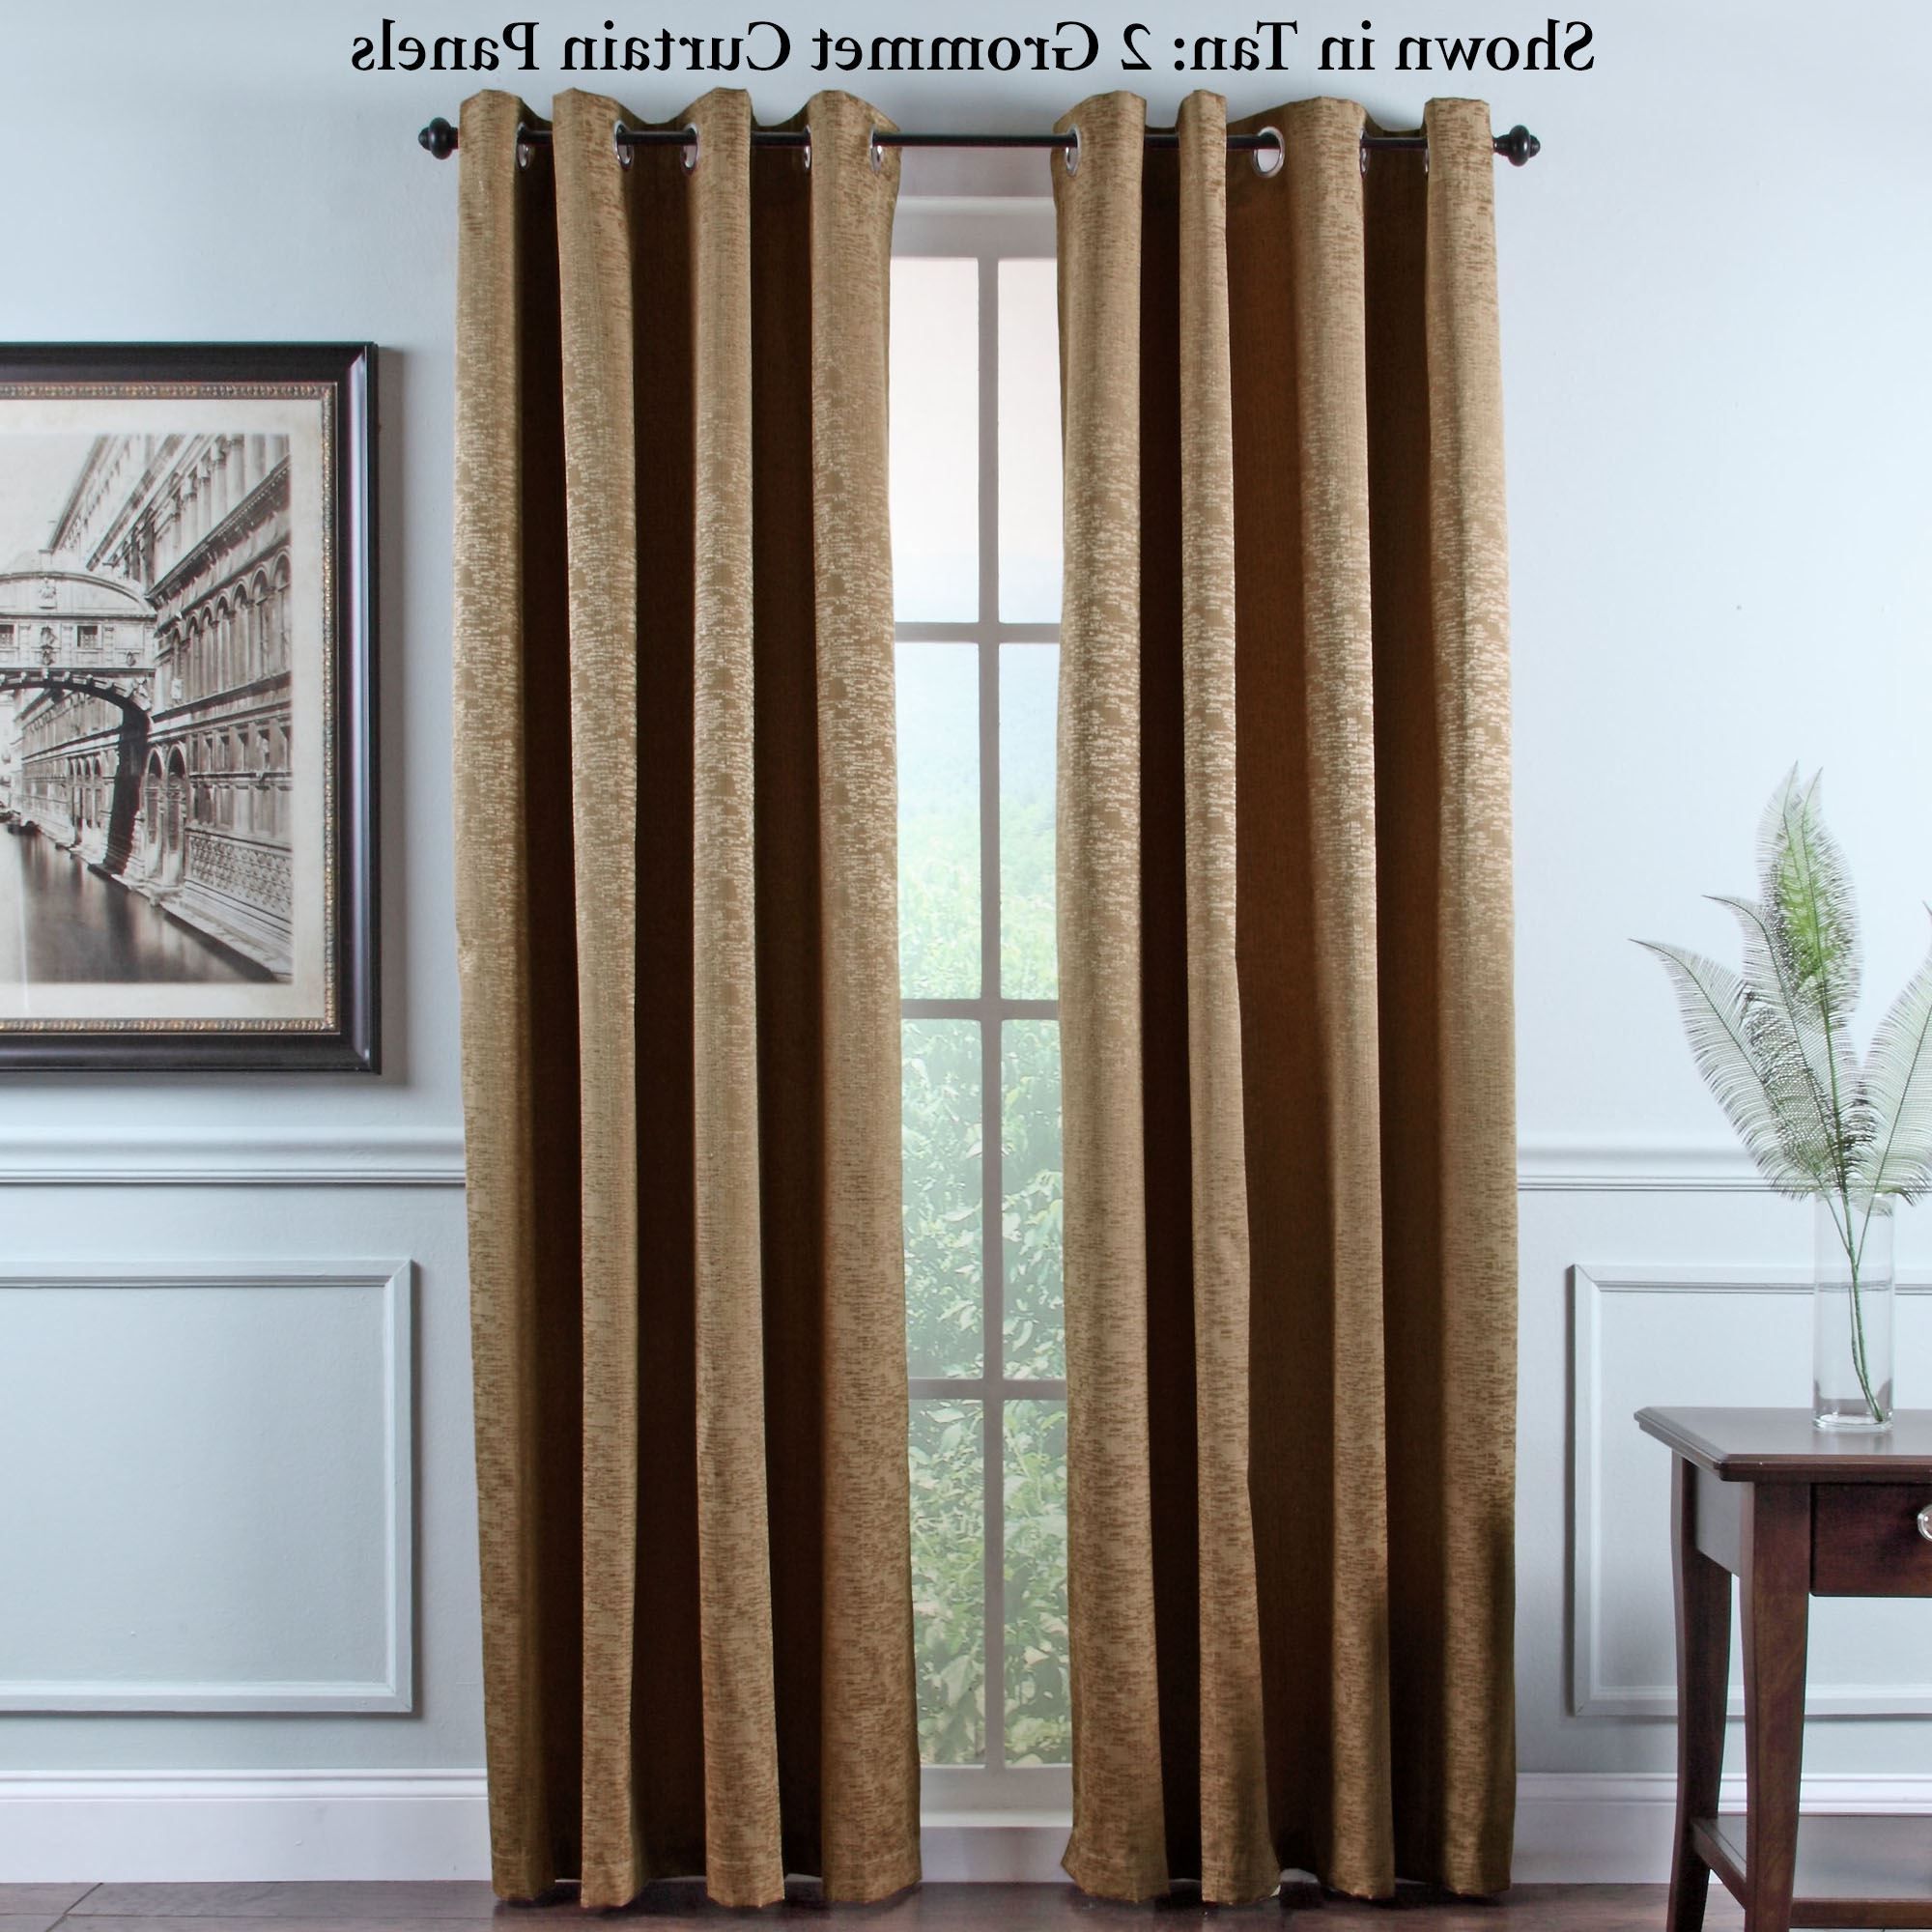 Grommet Room Darkening Curtain Panels In Widely Used Portland Room Darkening Insulated Grommet Curtain Panels (View 6 of 20)